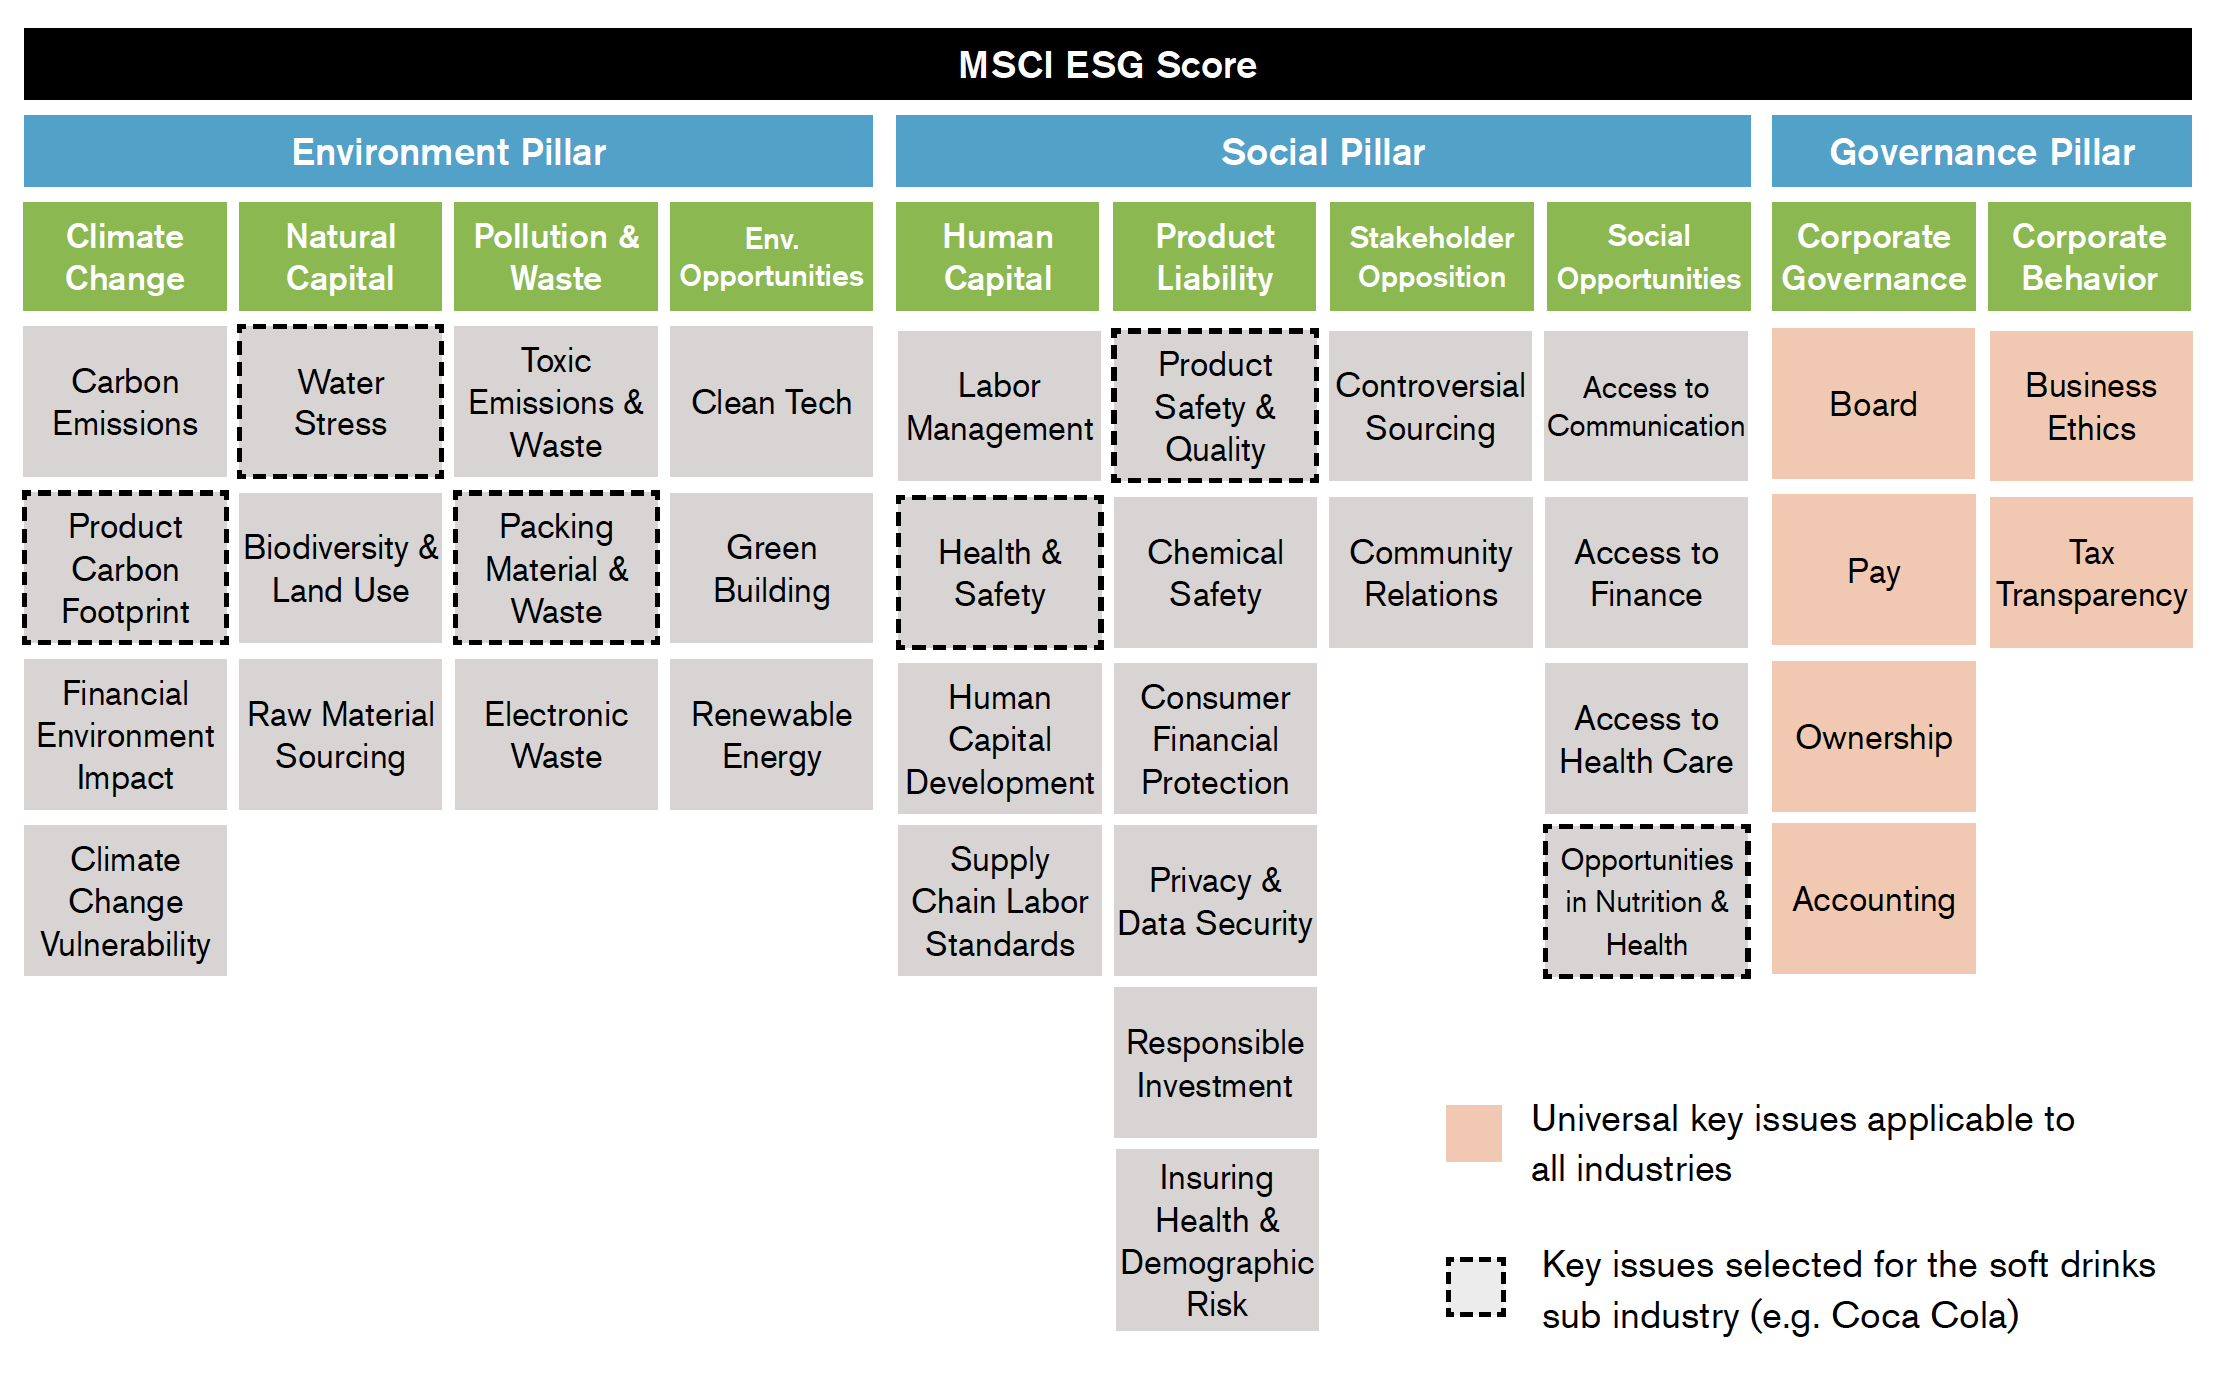 MSCI ESG Ratings Key Issue Framework